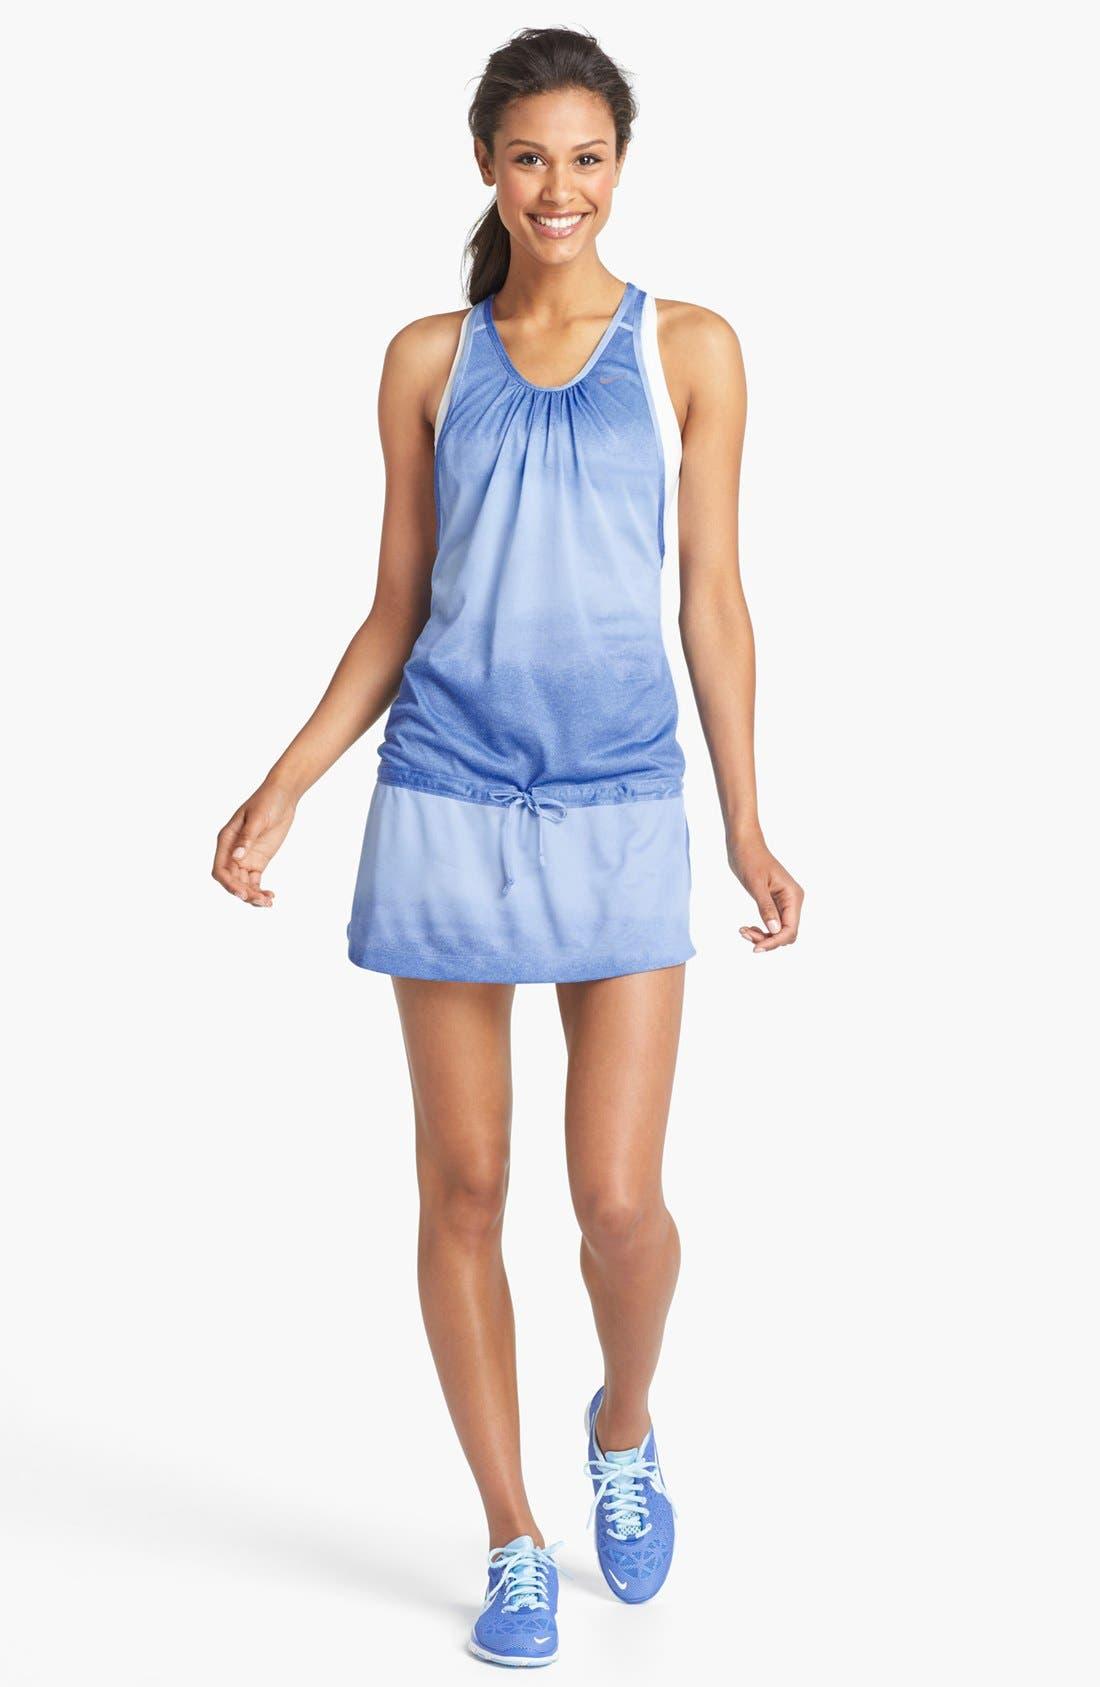 Alternate Image 1 Selected - Nike Tie Dye Running Dress